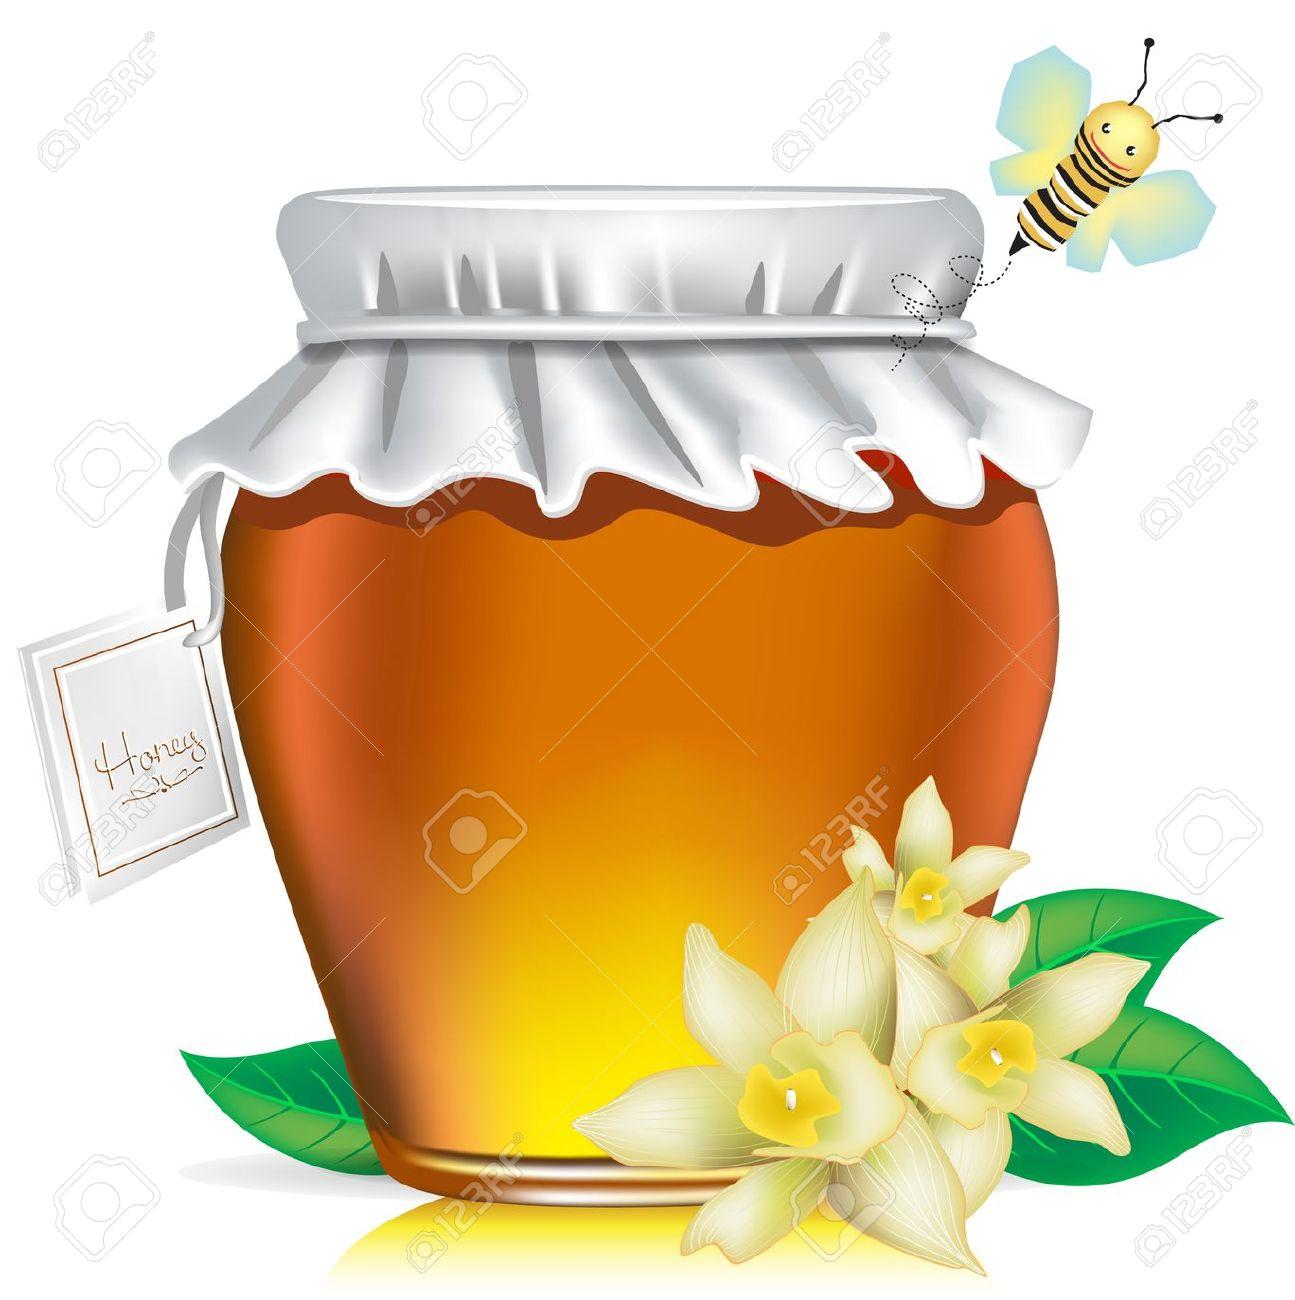 Honey Clip Art Free | Clipart Panda - Free Clipart Images